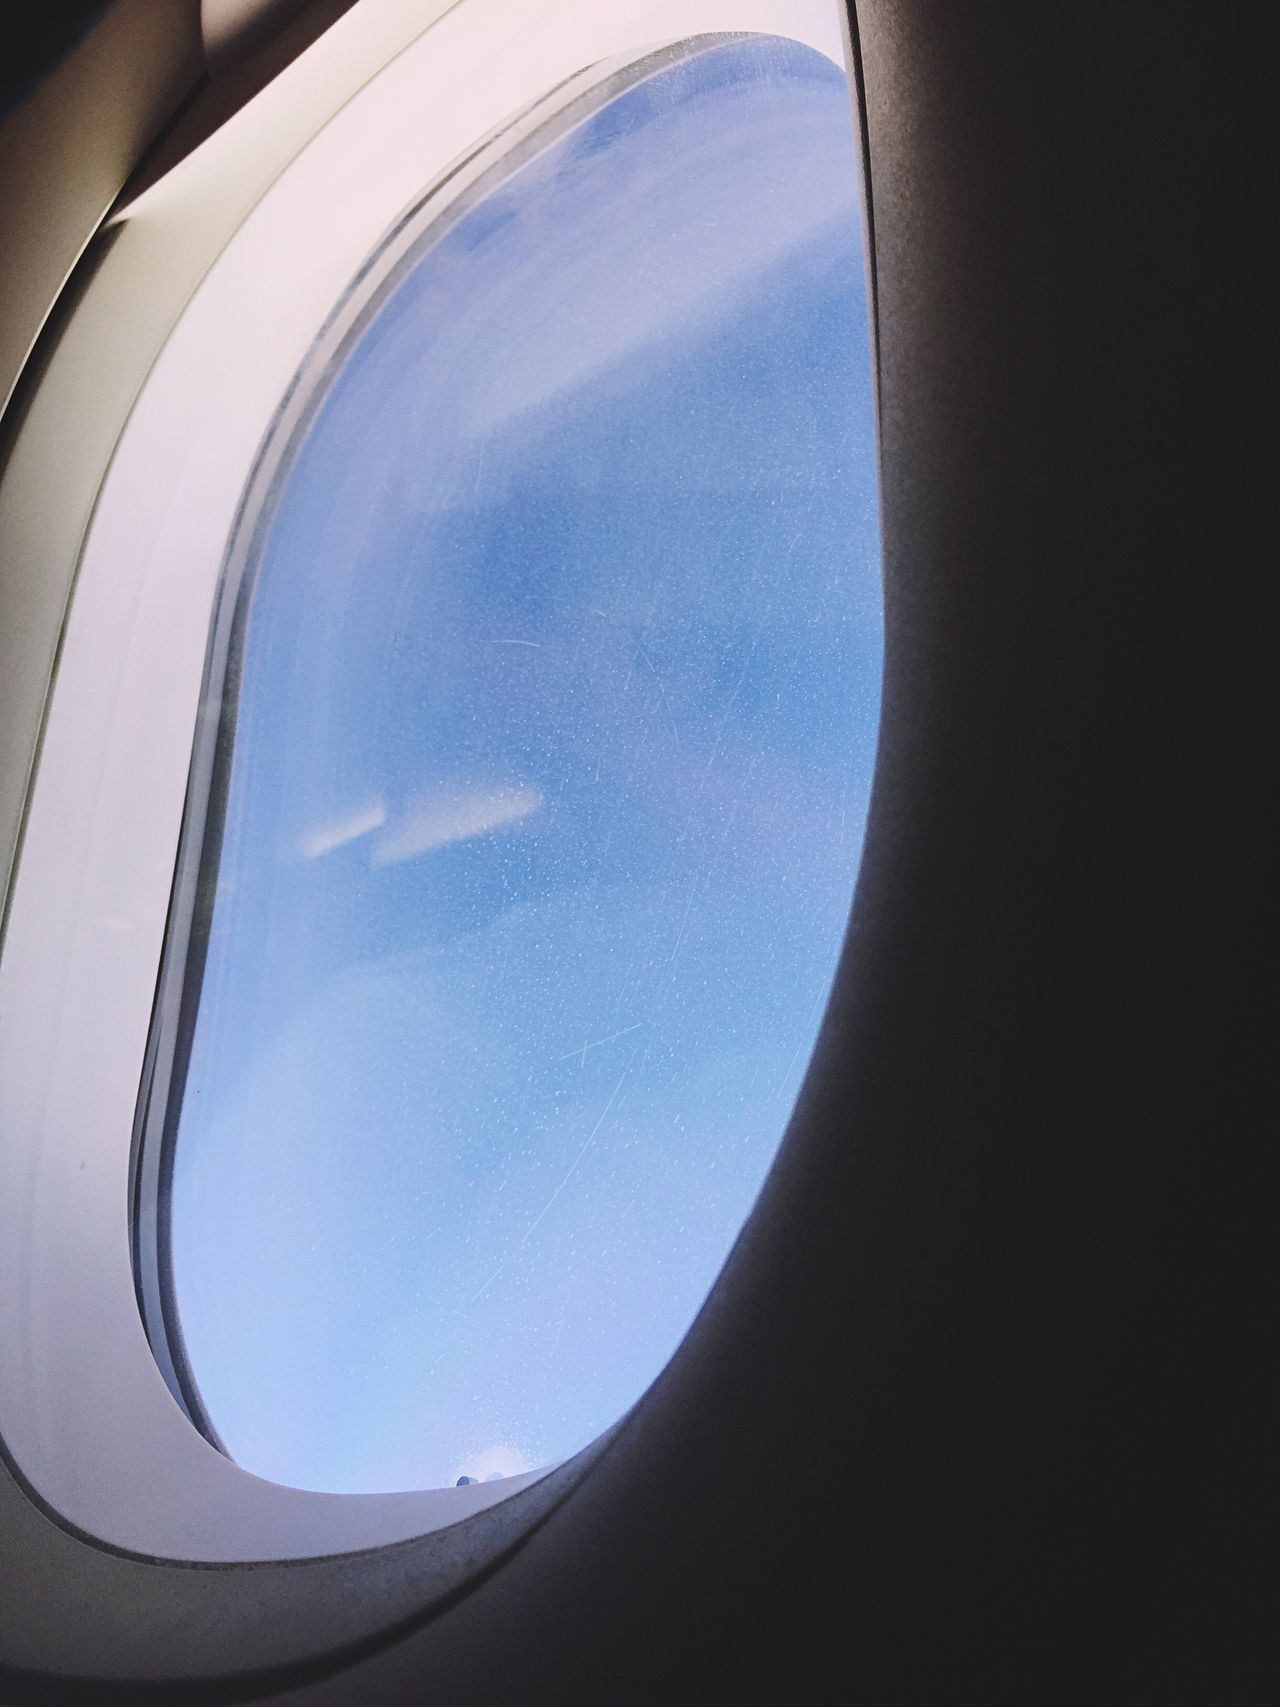 From An Airplane Window Geometry Geometric Shape Blue Window Airplane Window No People Day